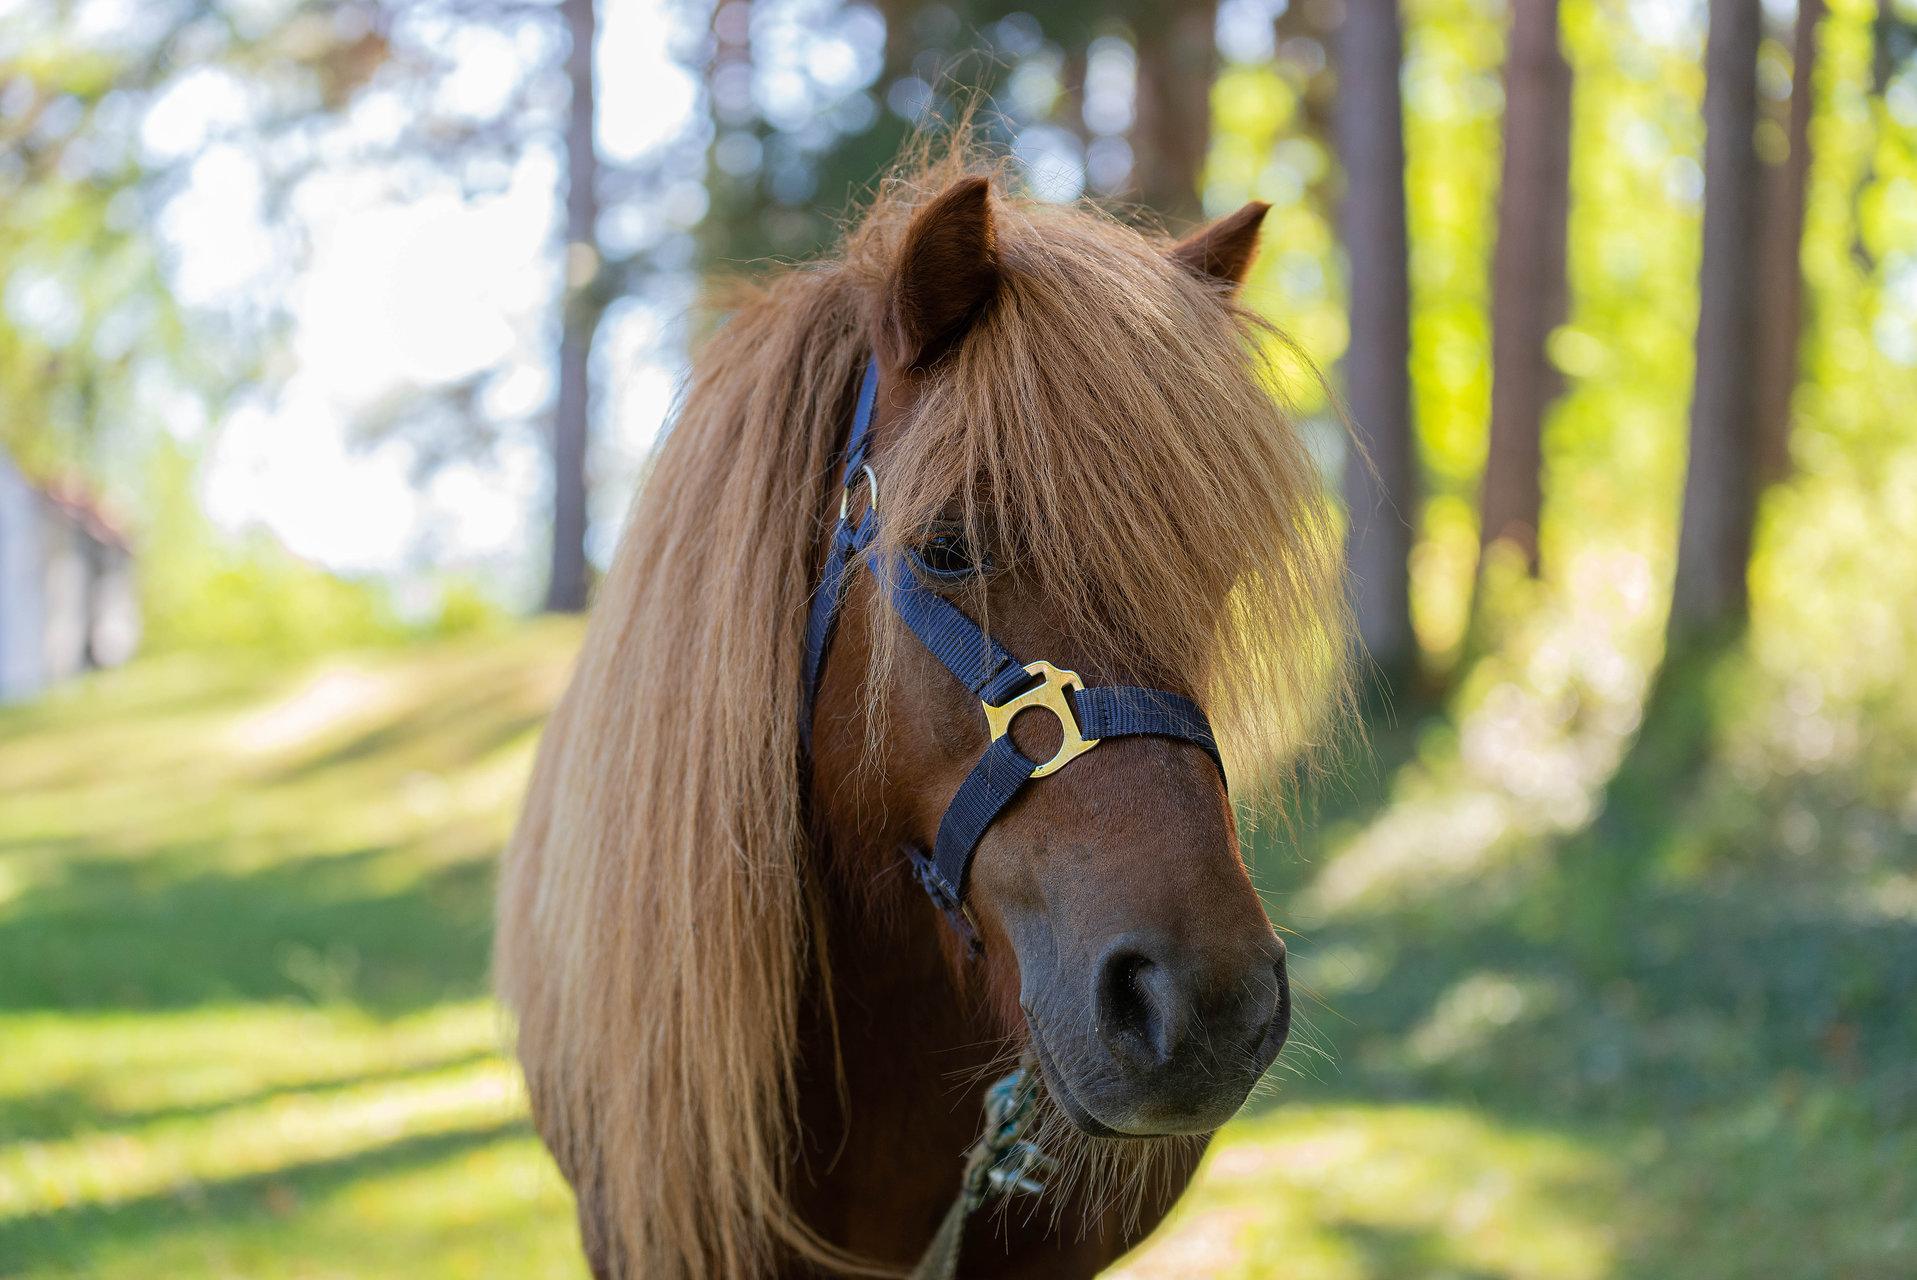 Photo in Wild life | Author Milen Petrov - petrov_m | PHOTO FORUM